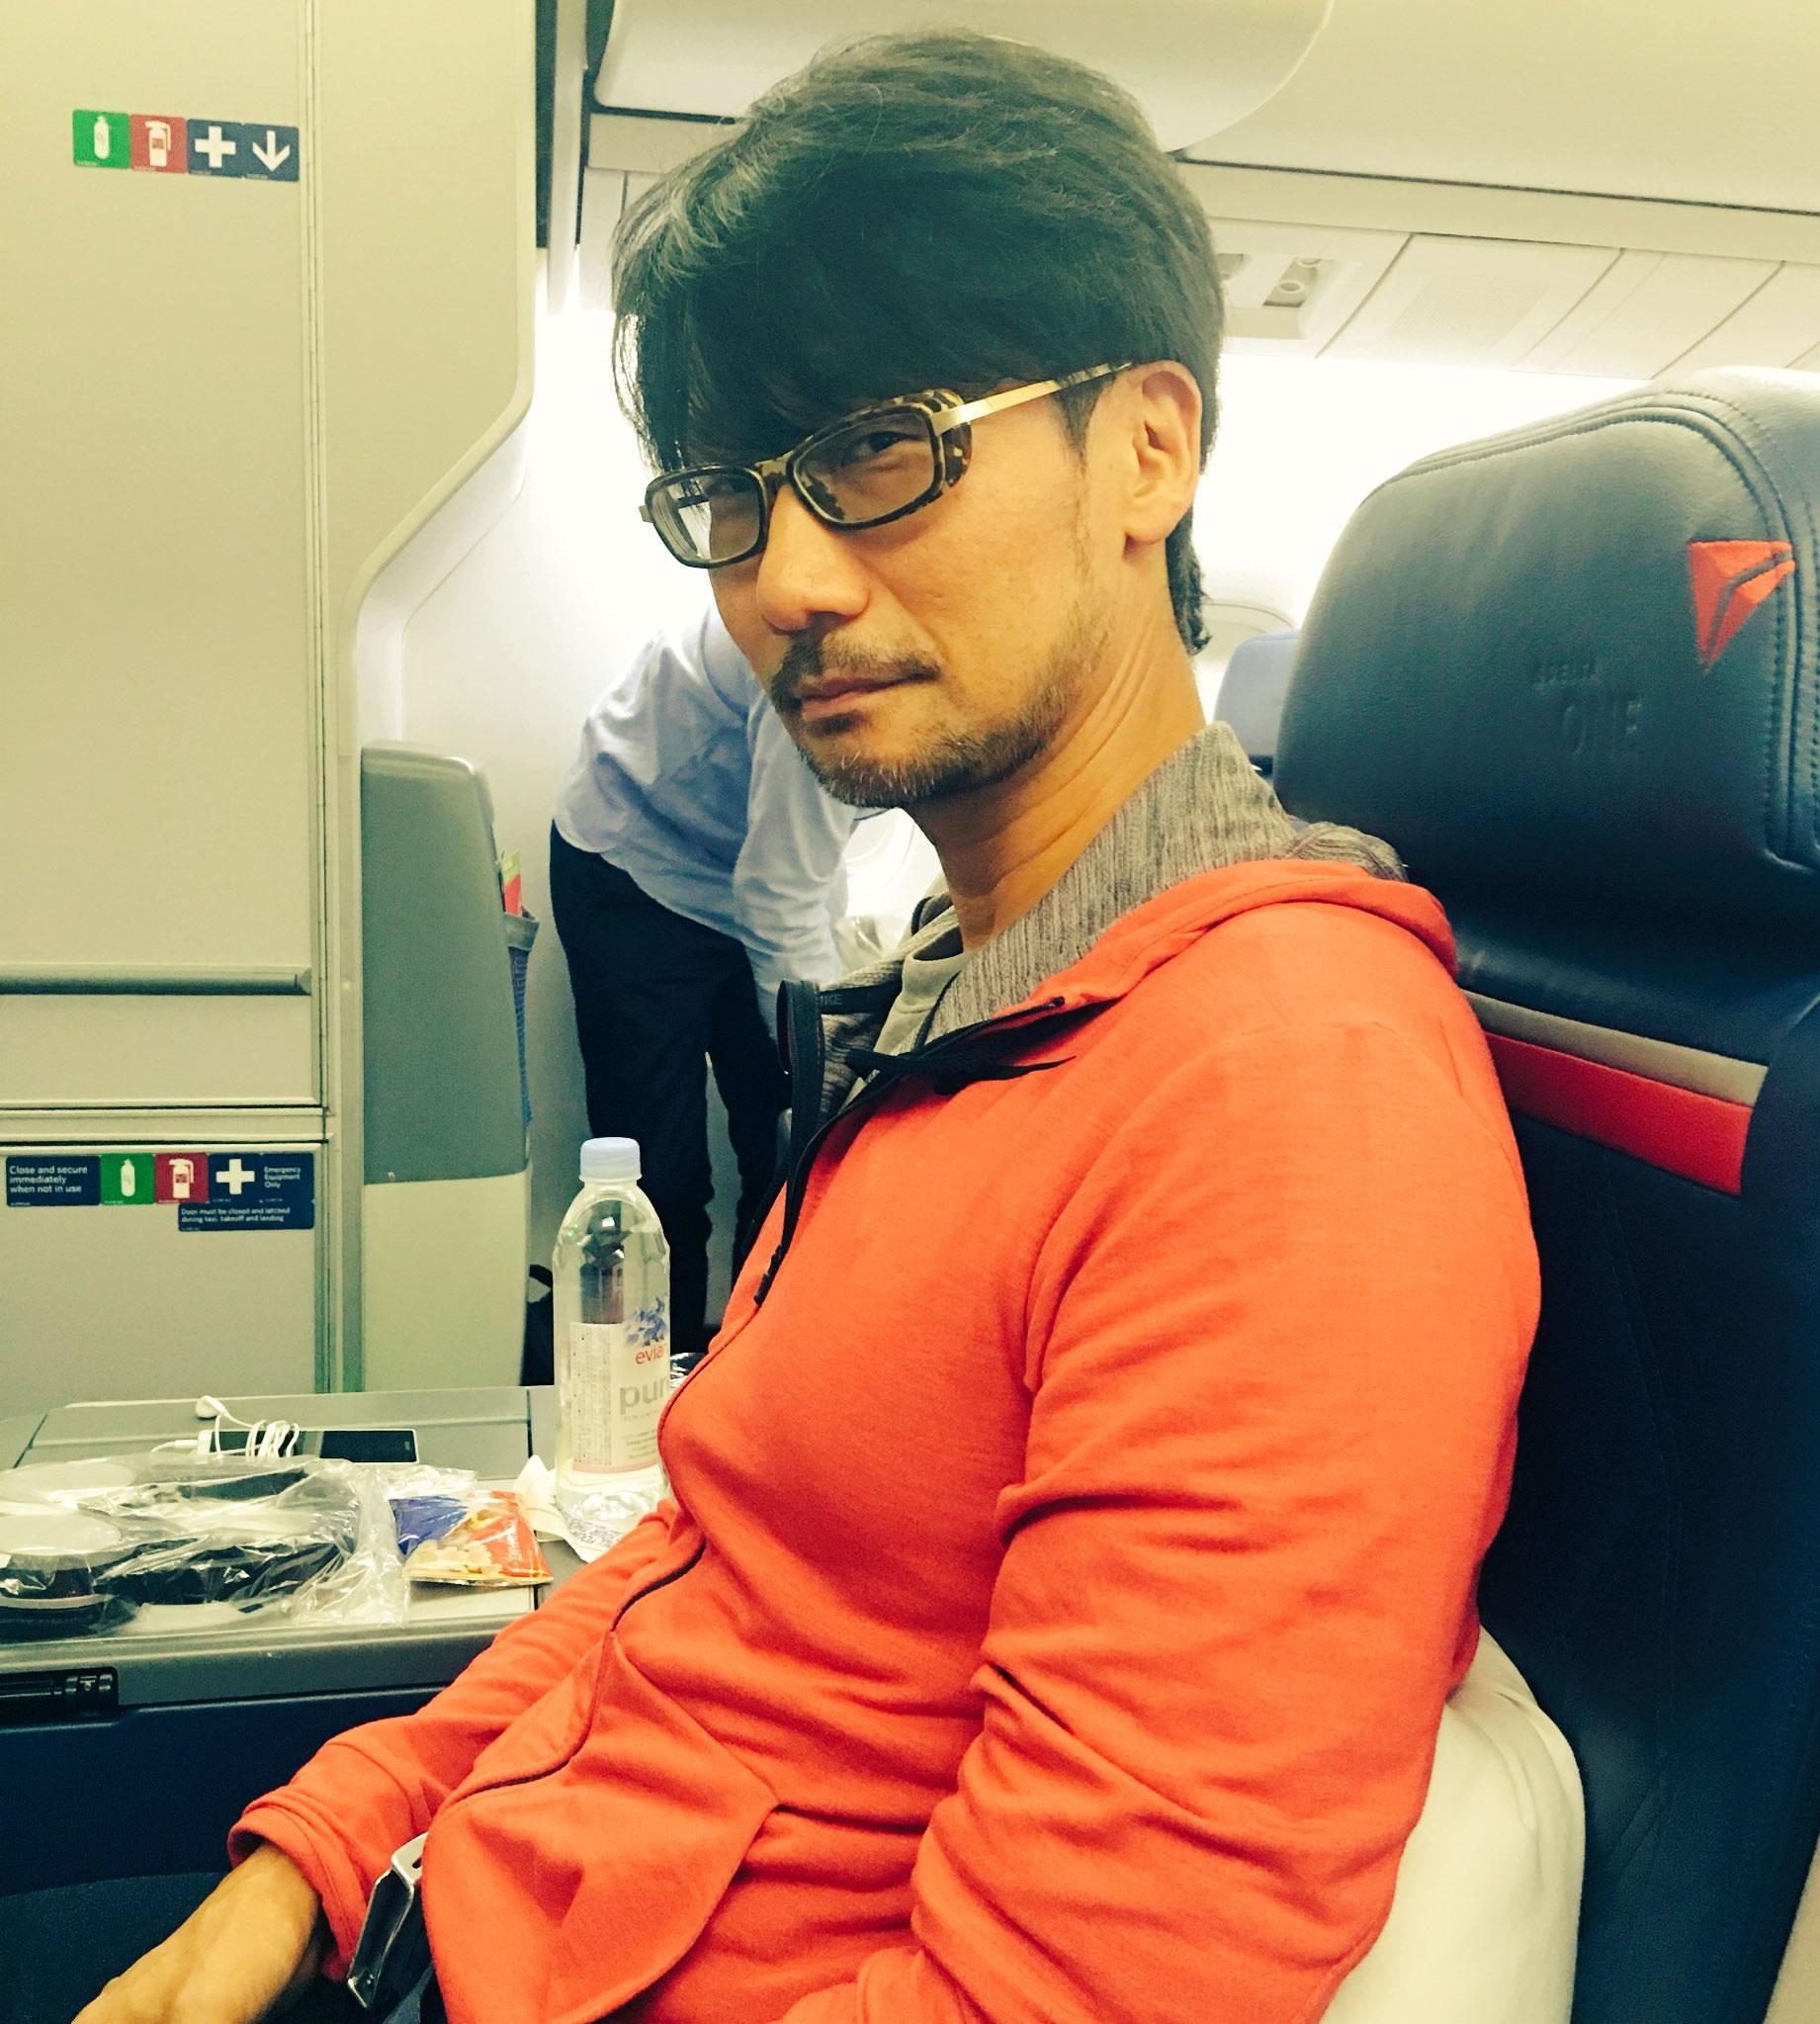 « Hideo Kojima, aujourd'hui. » – Ayako Terashima, le 17 octobre 2016